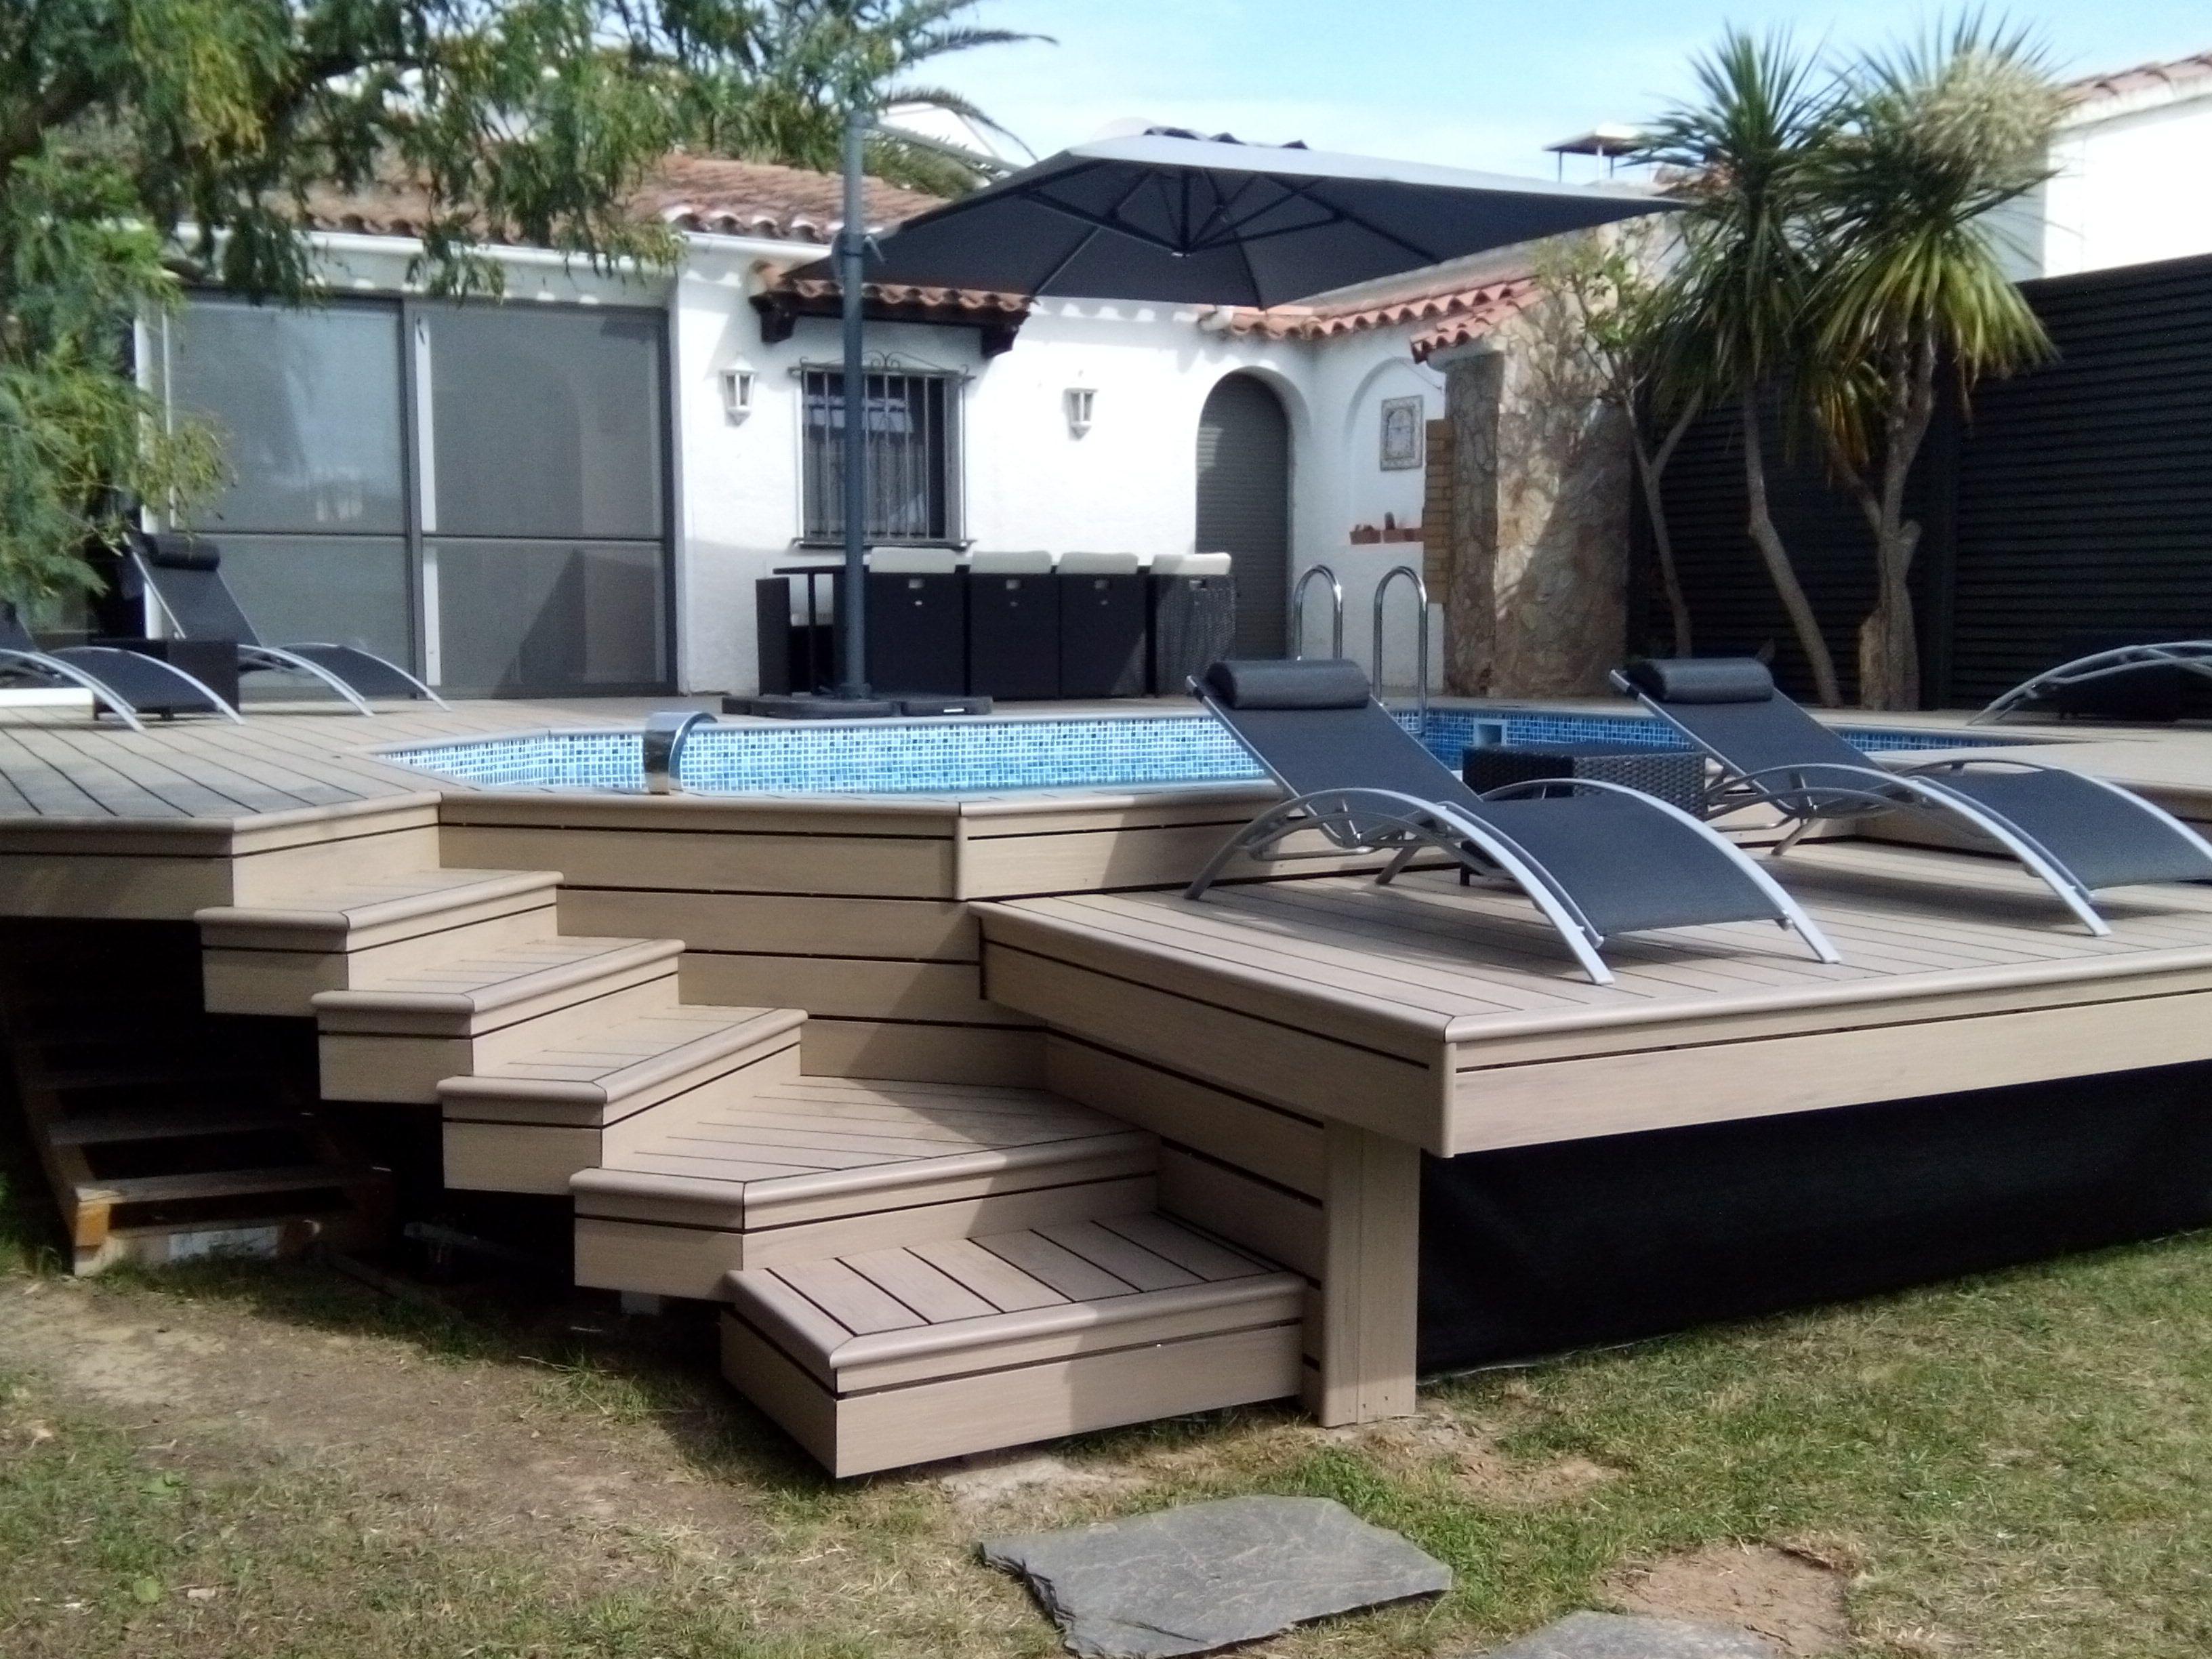 Best Transat Jardin Alice Garden Photos - House Design - marcomilone.com